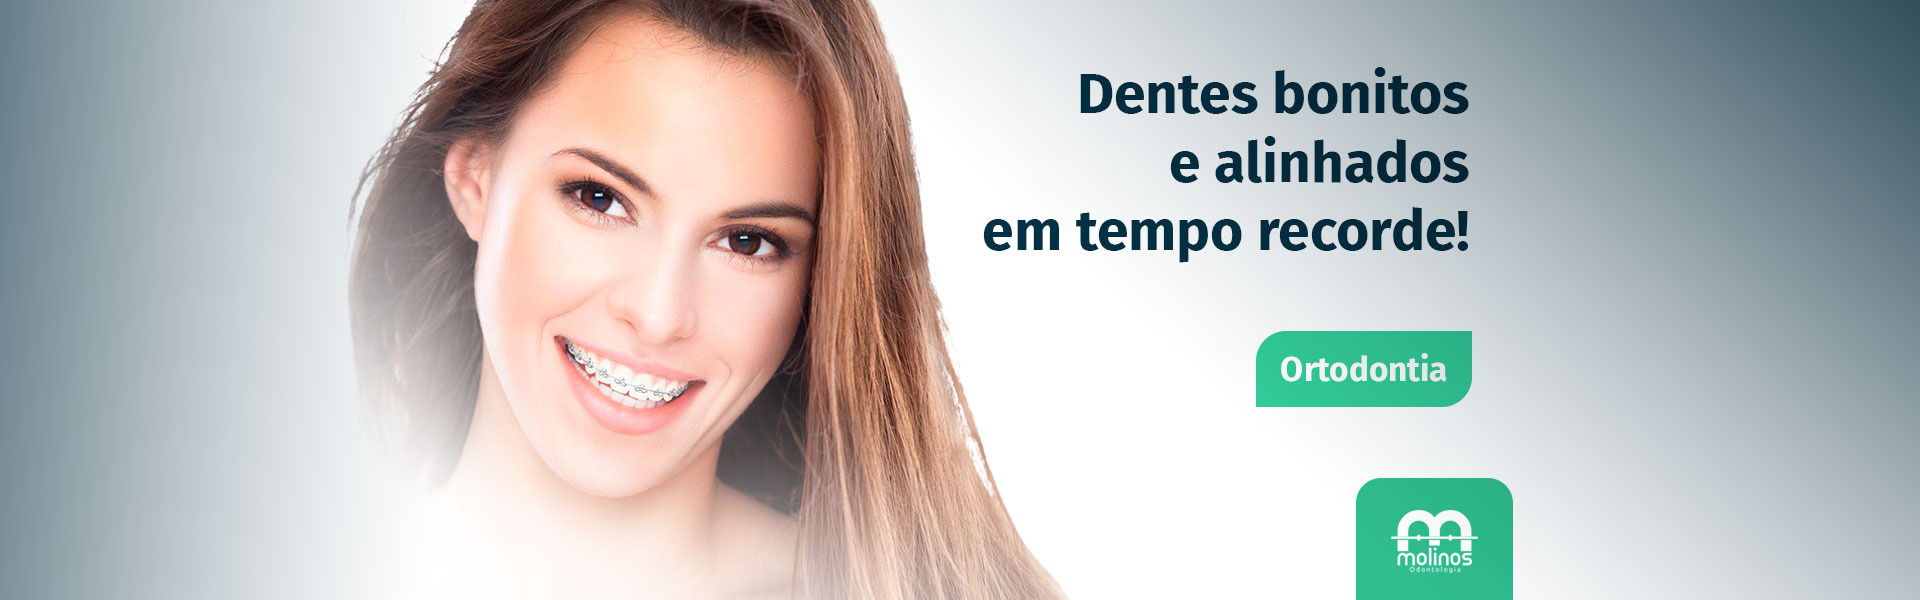 Início - Molinos Odontologia - image banner-3 on https://molinosodontologia.com.br